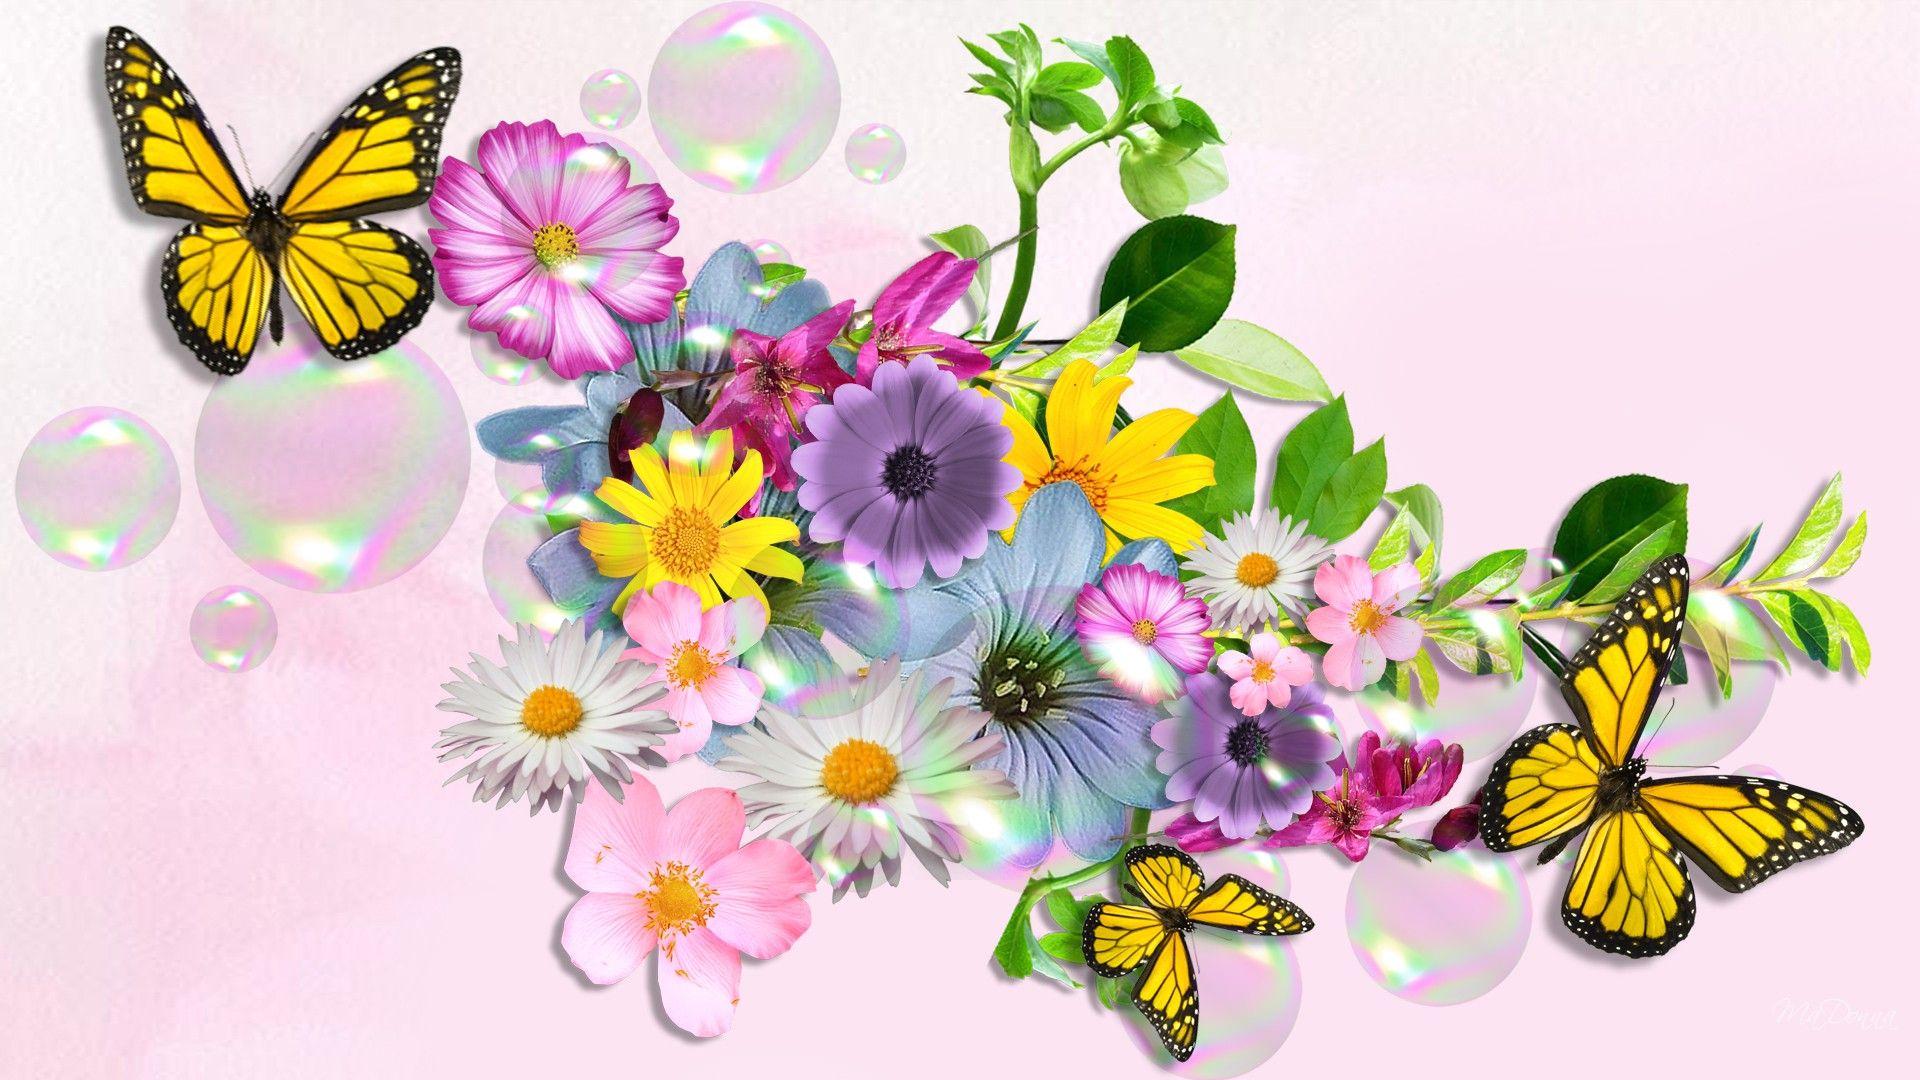 YouWall Yellow Butterfly Wallpaper wallpaperwallpapersfree